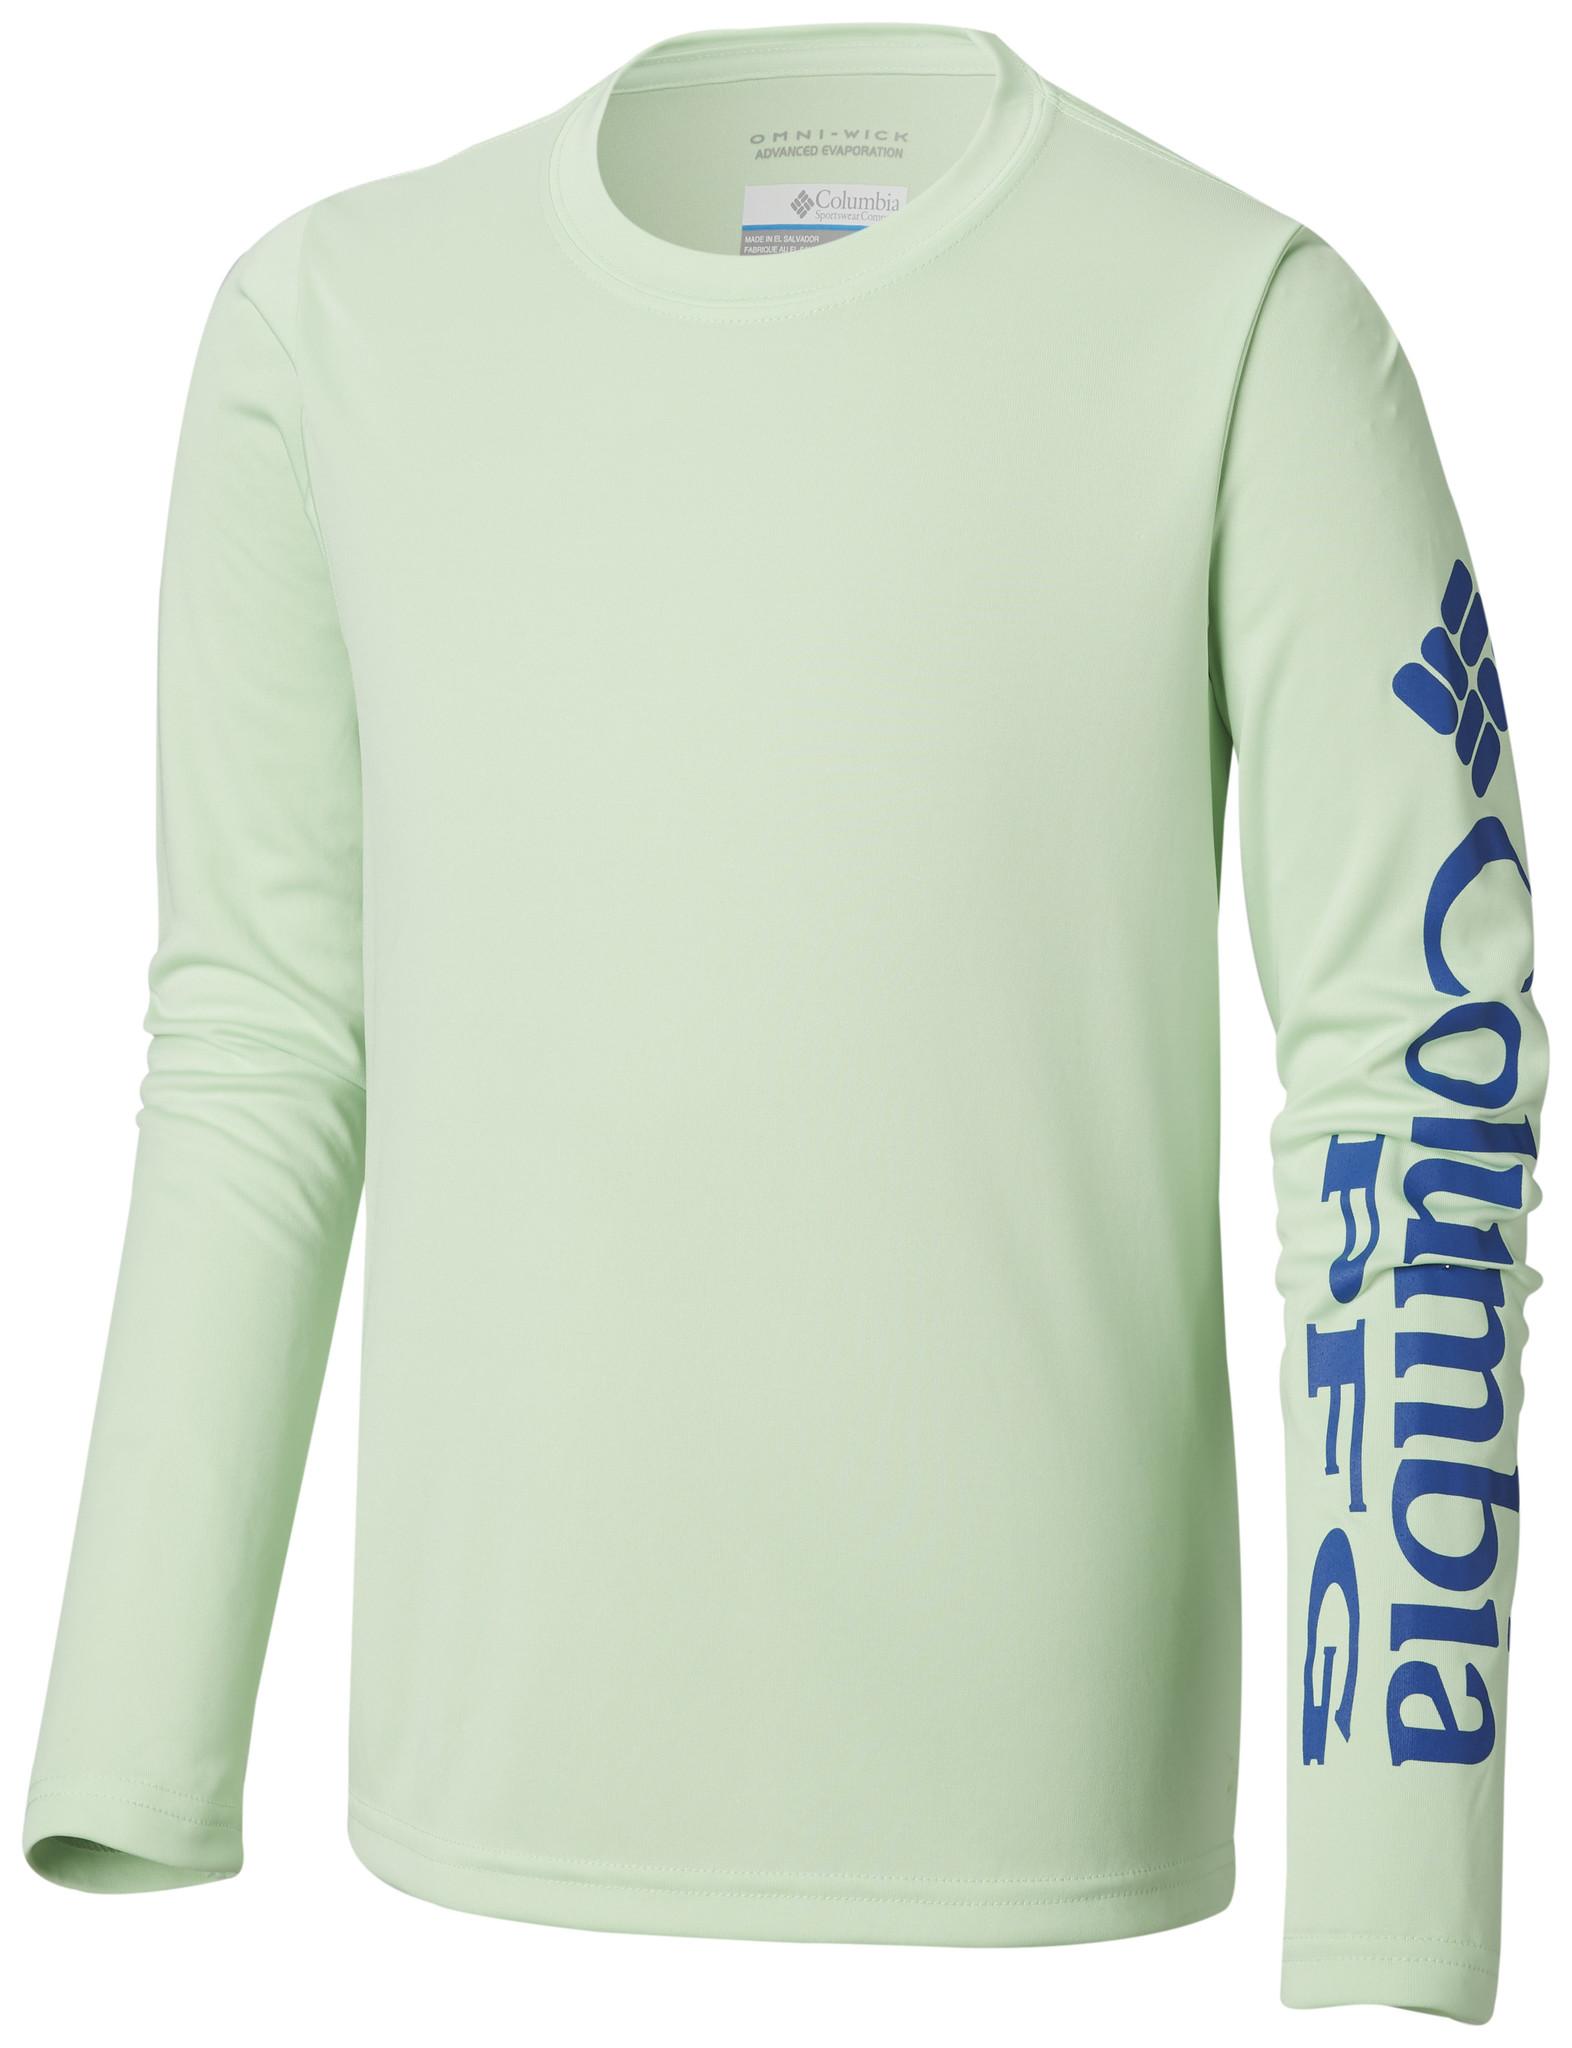 7bdd1215779 ... Columbia Sportwear Kids' PFG Terminal Tackle™ Long Sleeve Tee ...